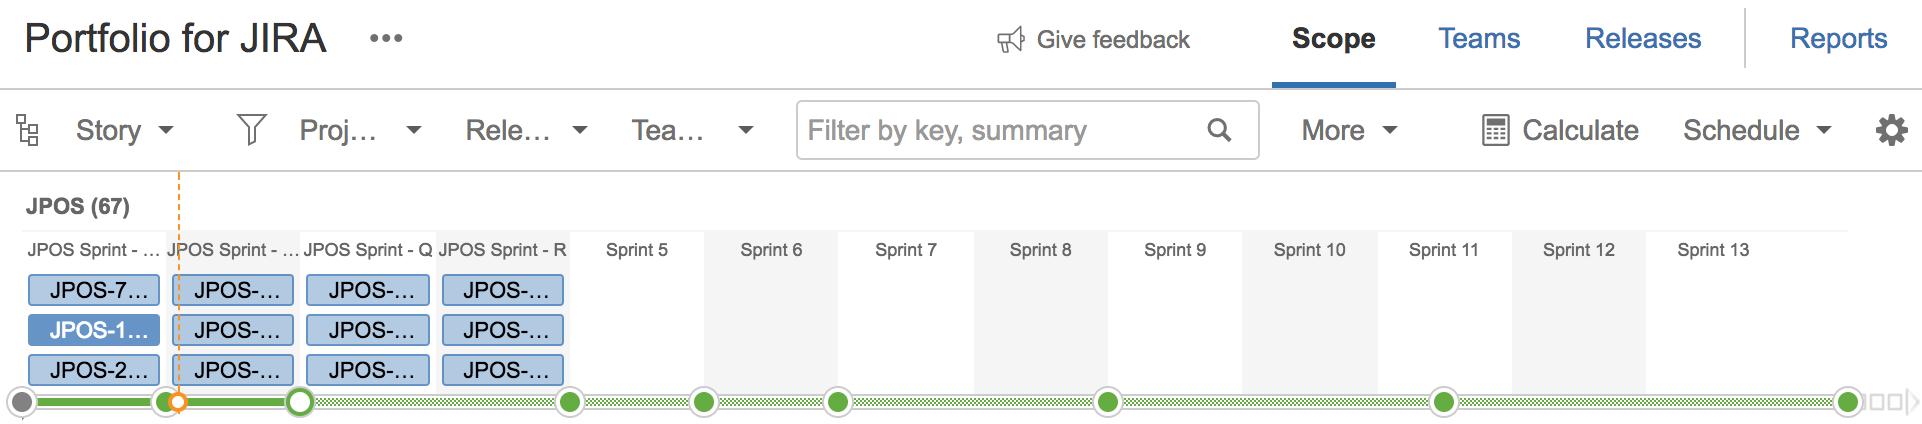 Getting started with Portfolio for Jira - Atlassian Documentation